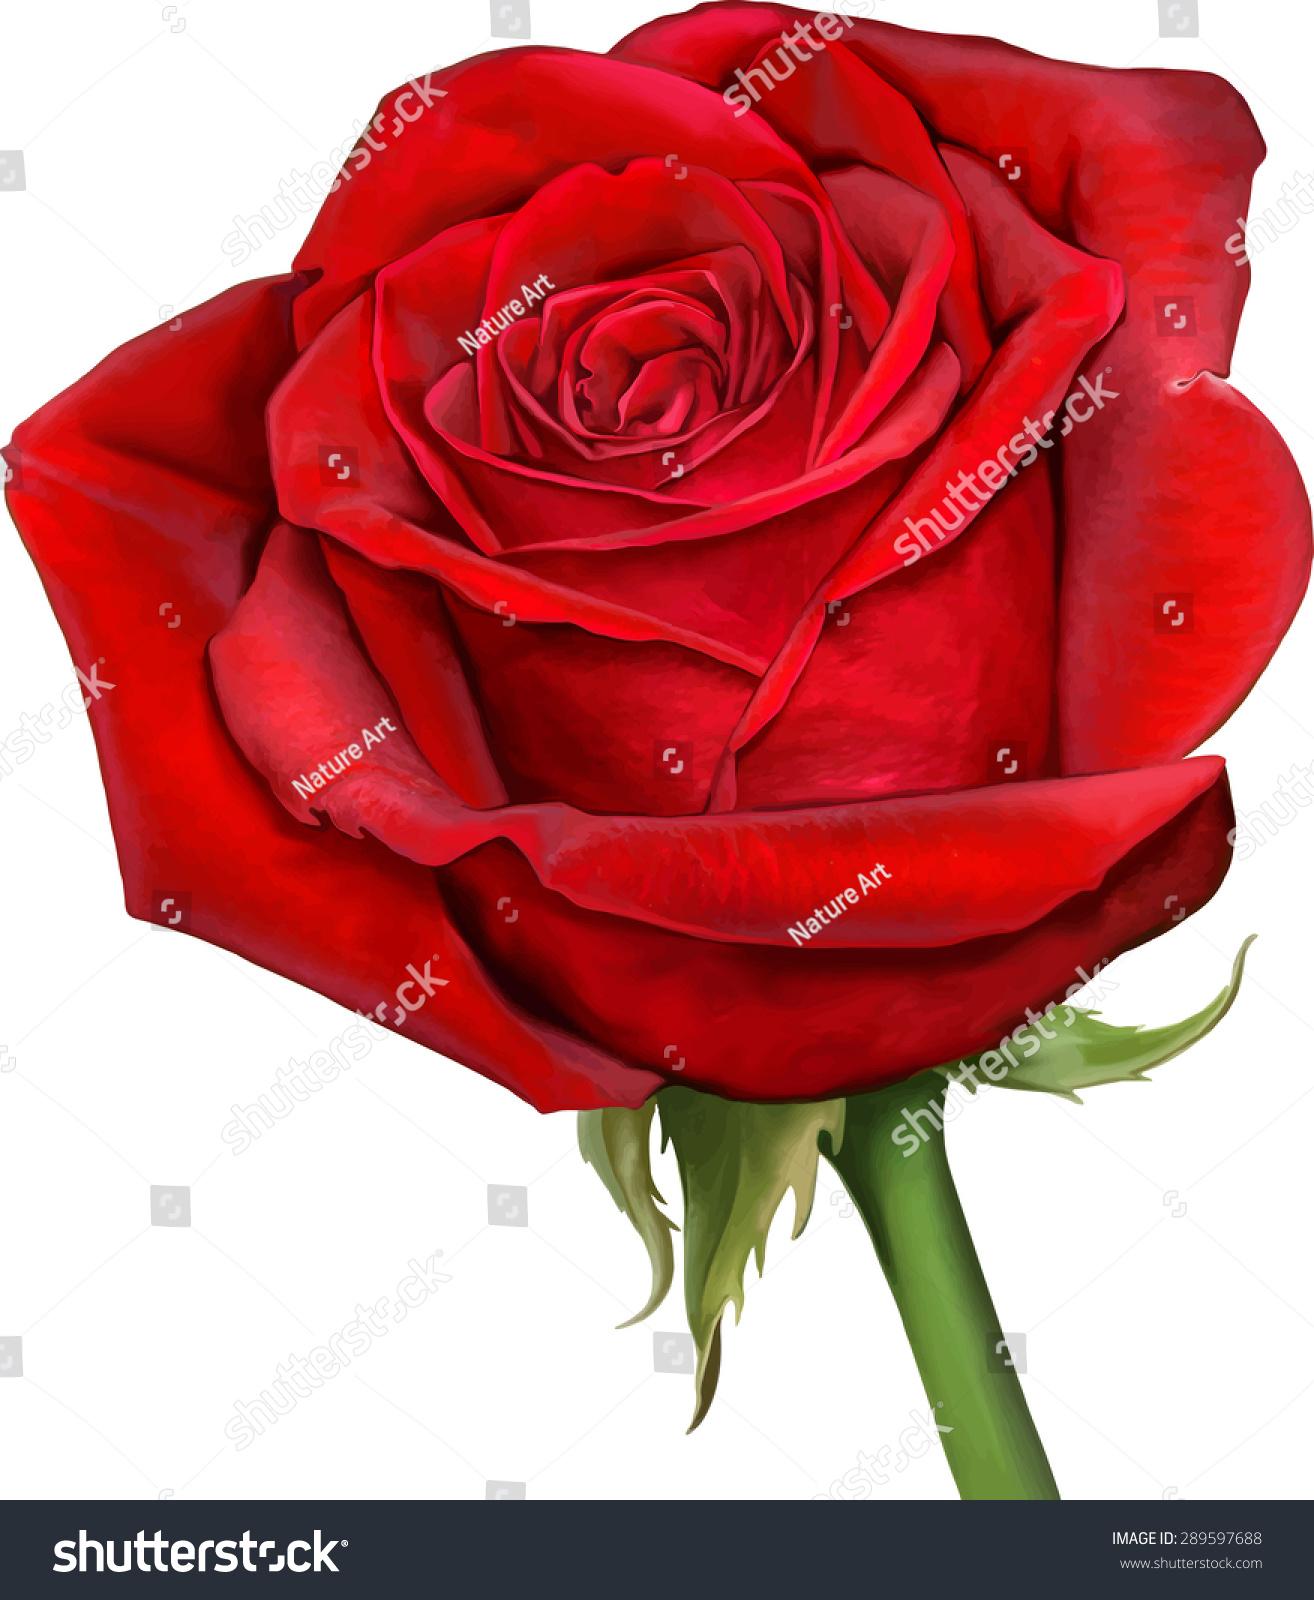 Free photo beautiful red rose red rose leaves free download beautiful colorful red rose flower isolated stock photo photo izmirmasajfo